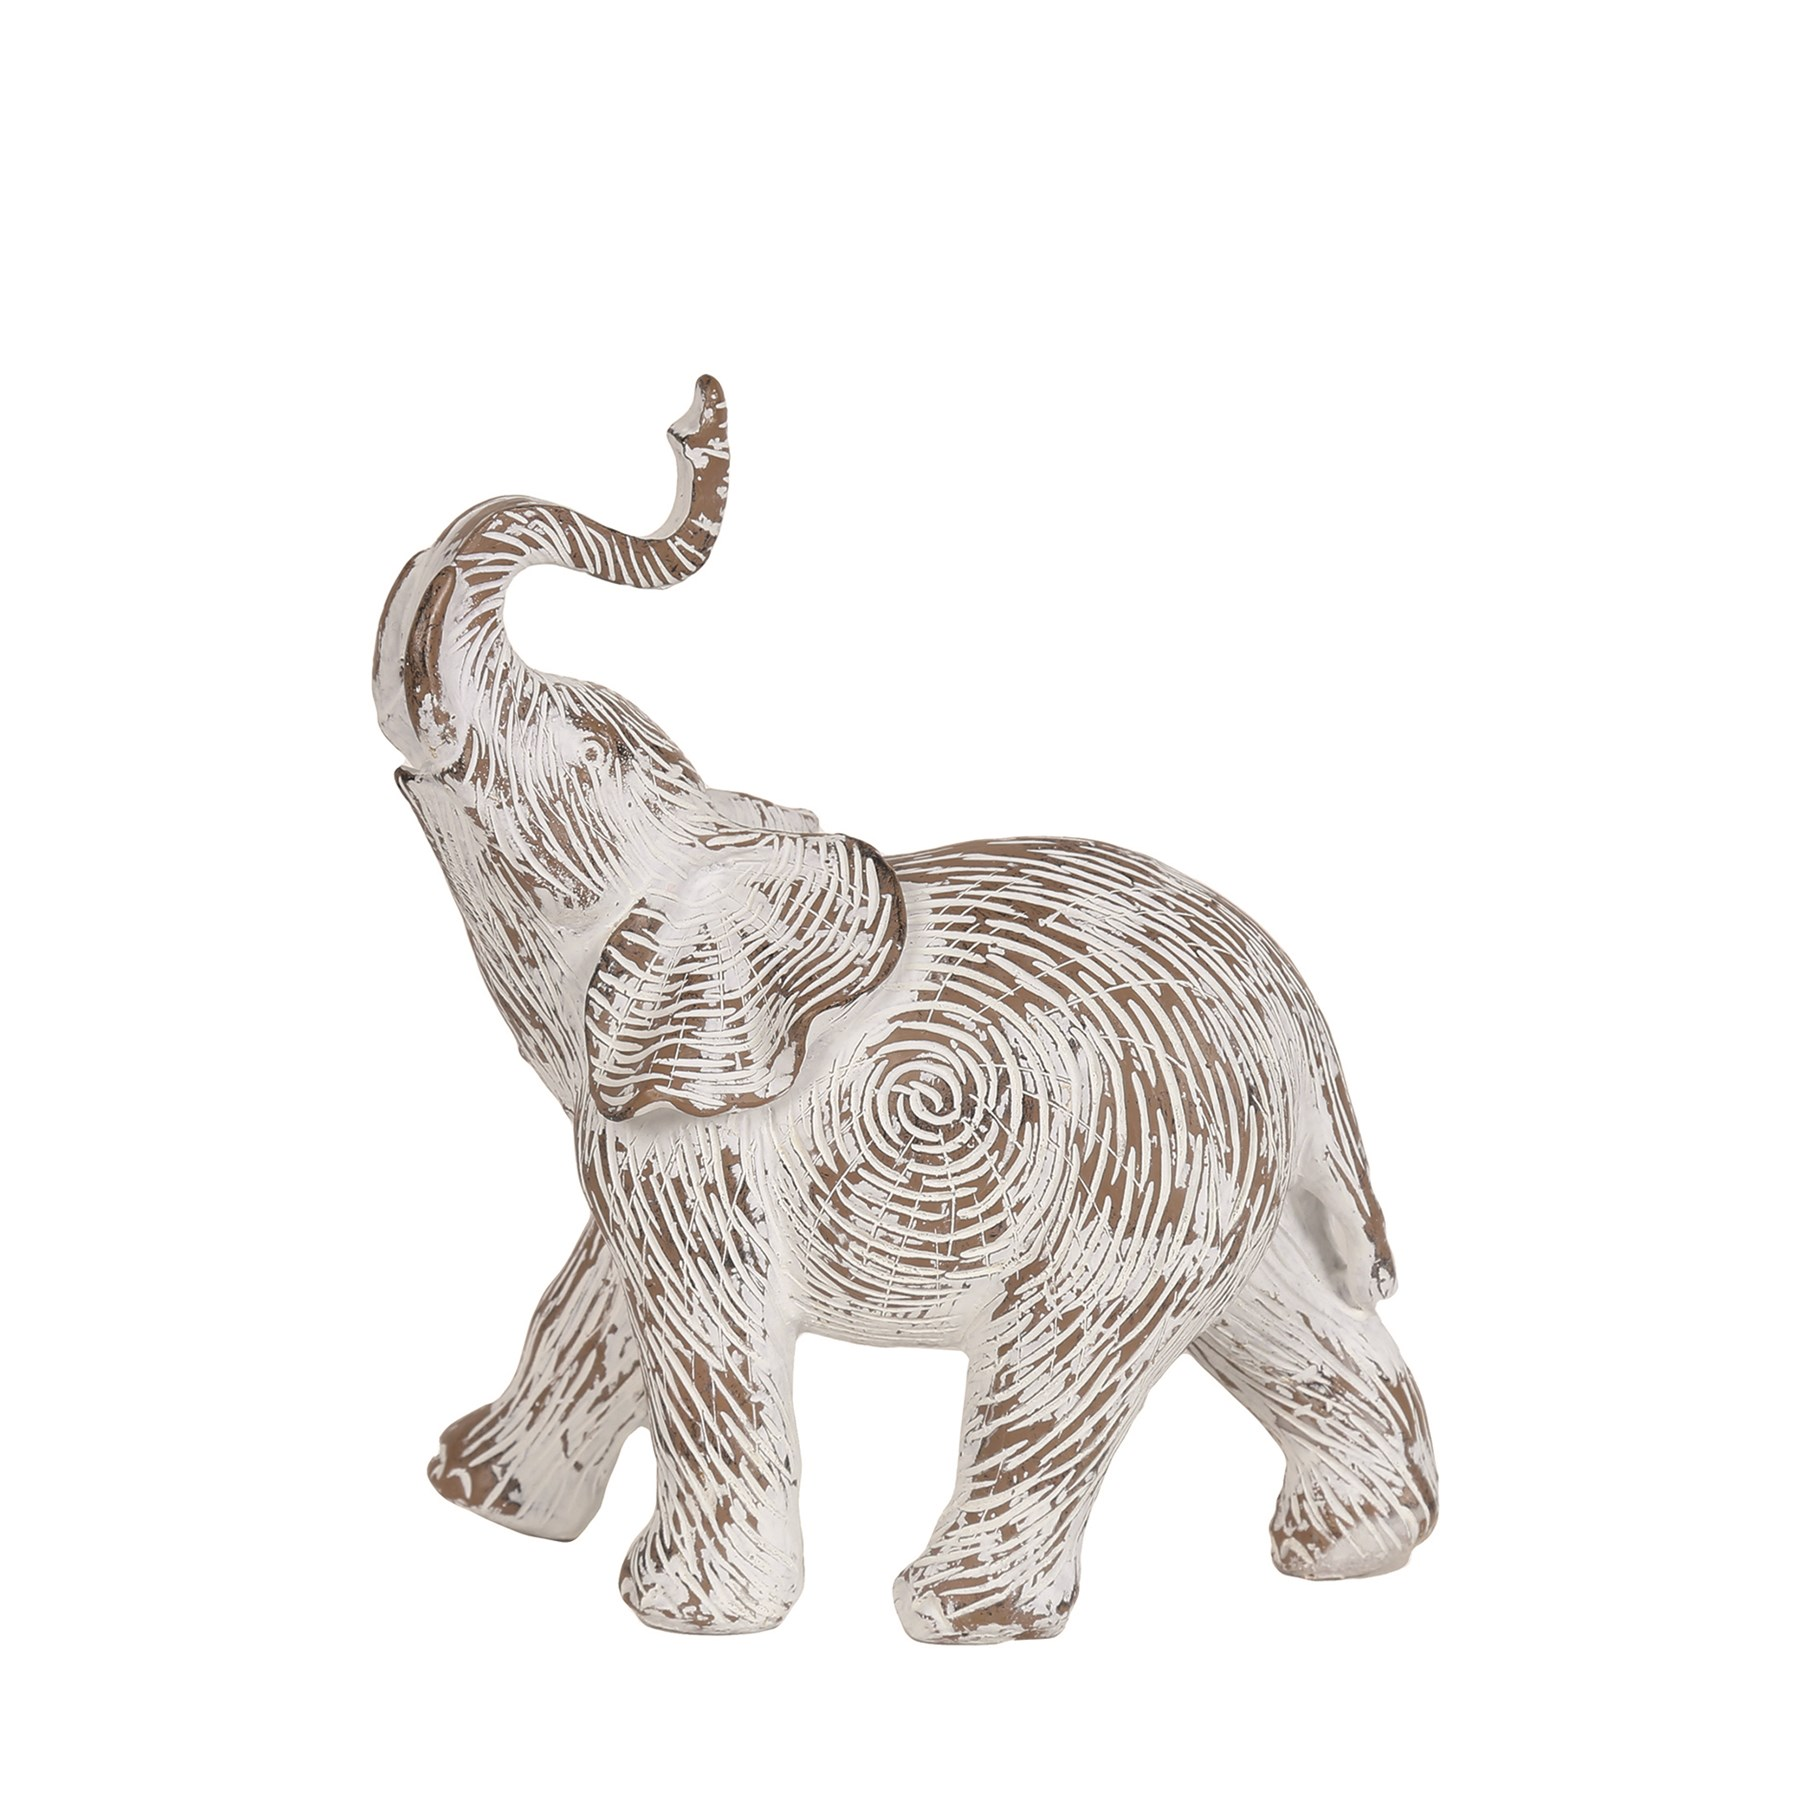 Decorative Etched Elephant 18.5cm